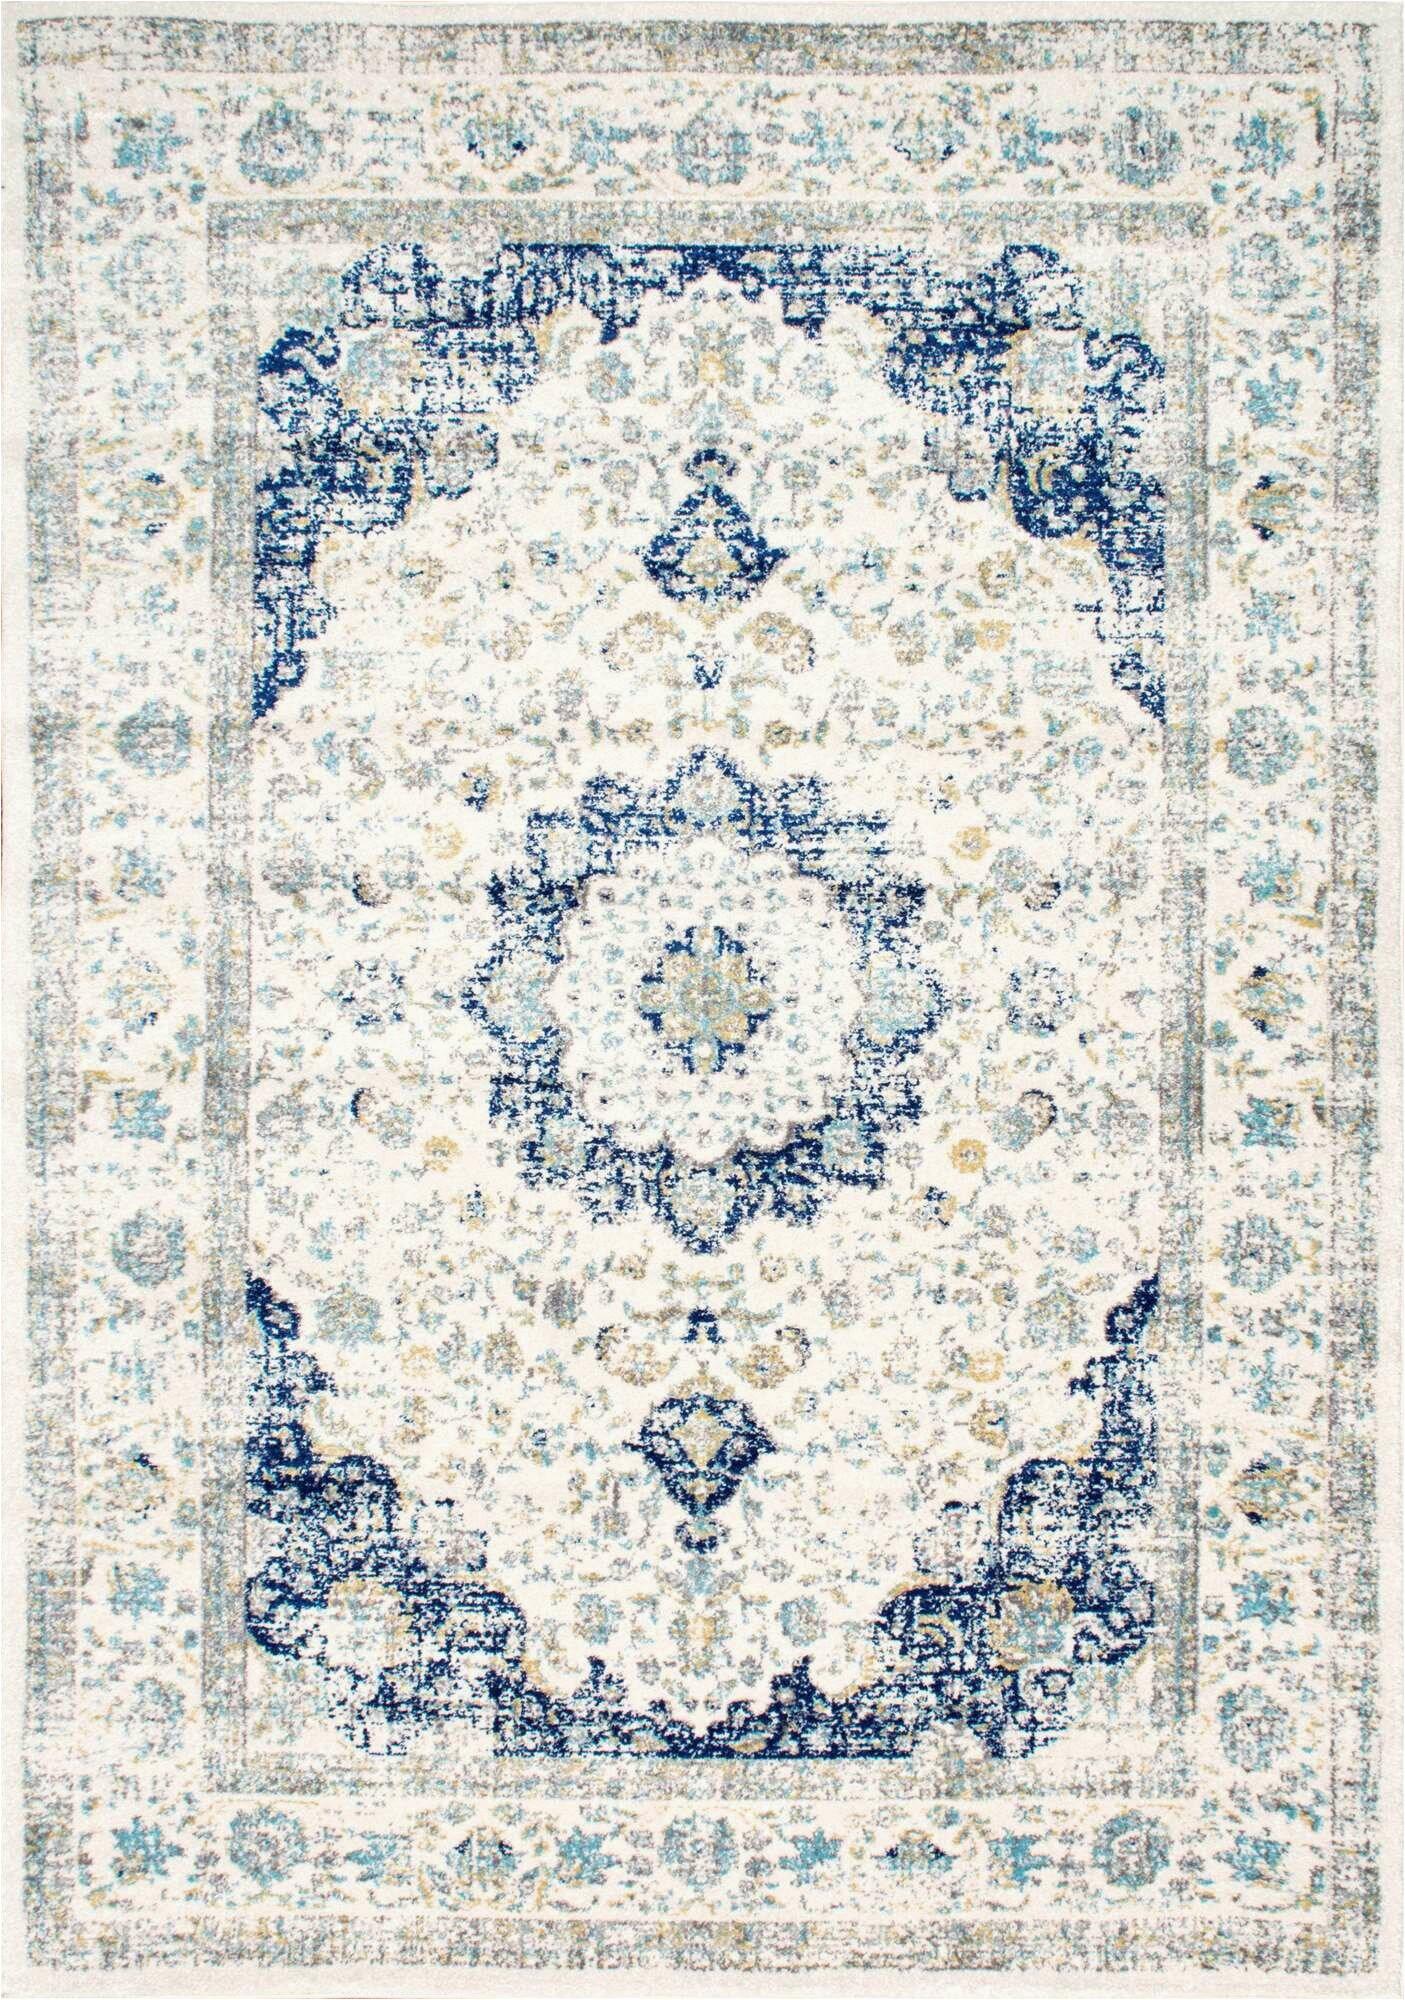 hosking persian inspired bluecream area rug lfmf3971 piid=0